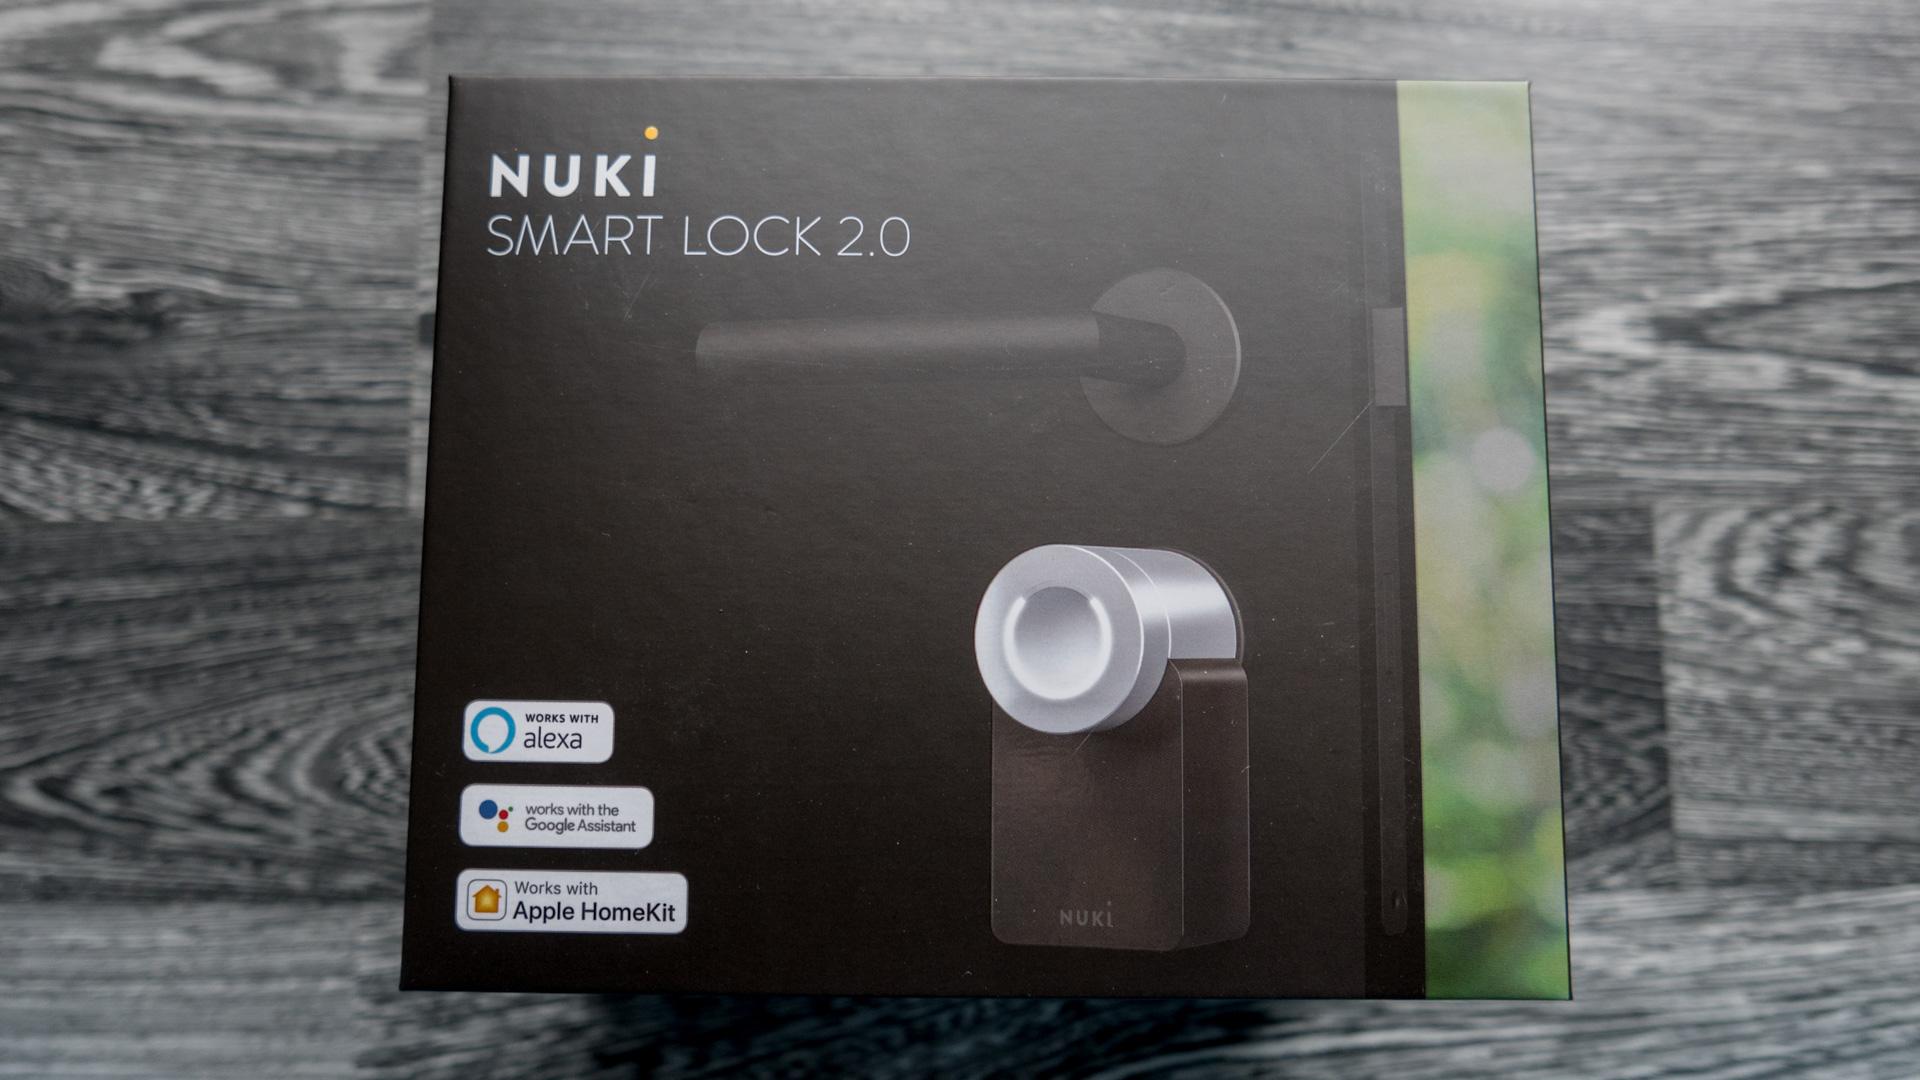 Nuki-2.0-Details-1